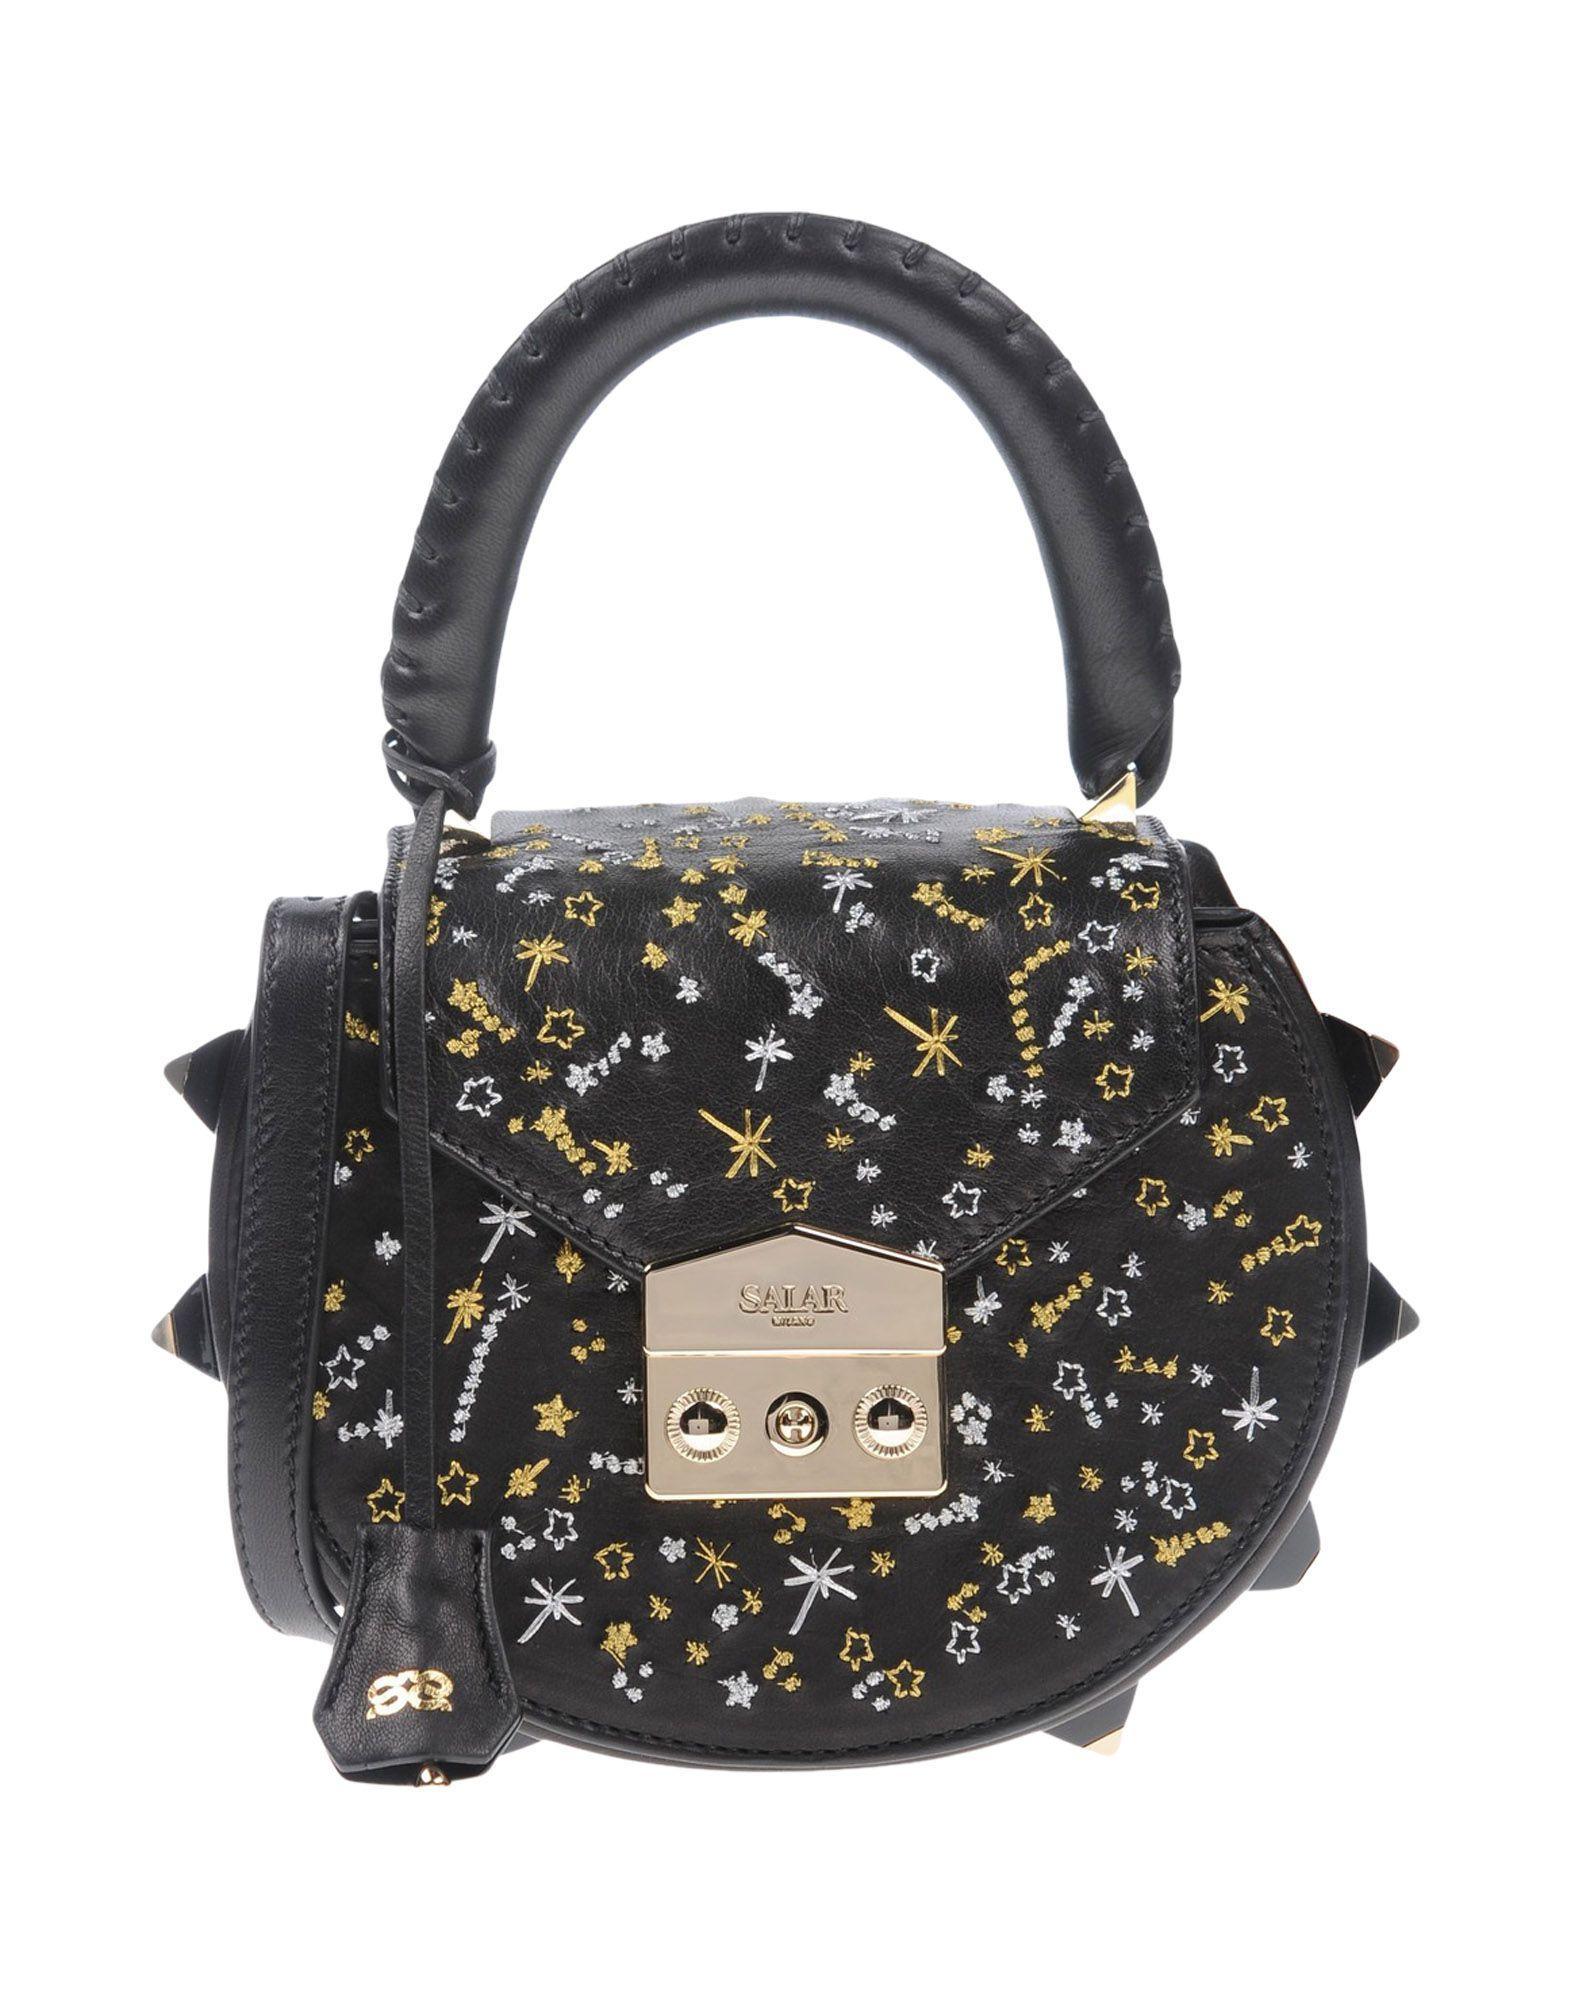 Salar Handbag In Black